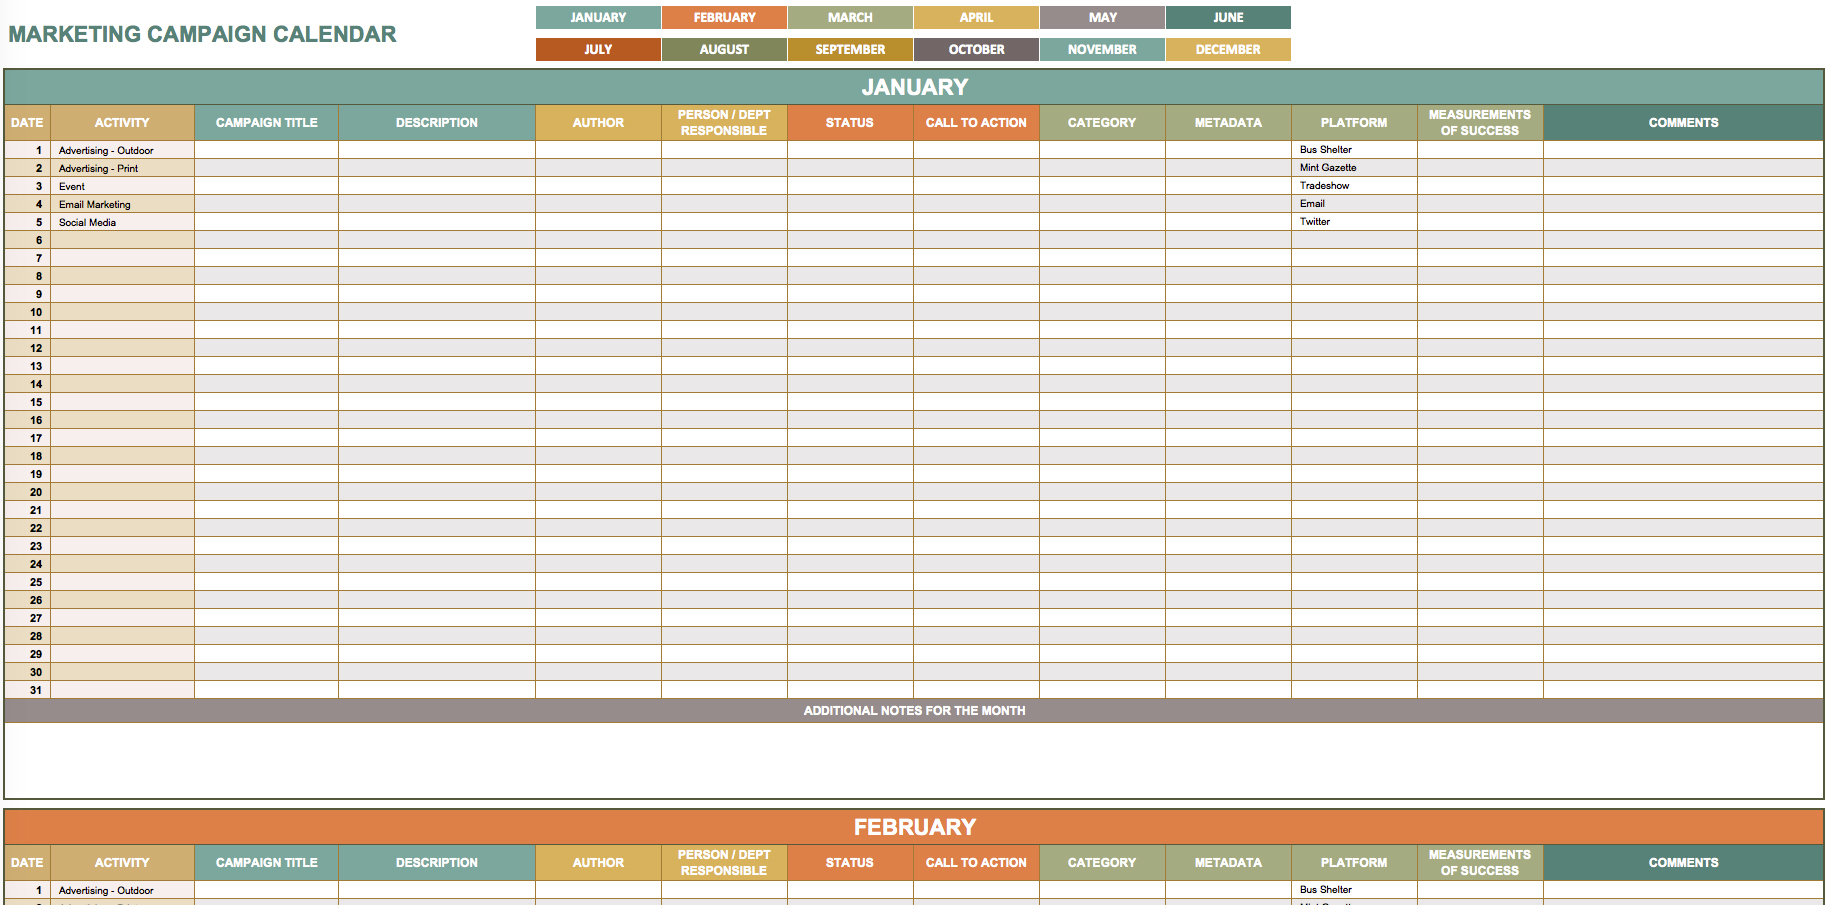 9 Free Marketing Calendar Templates For Excel - Smartsheet For Marketing Calendar Template Free